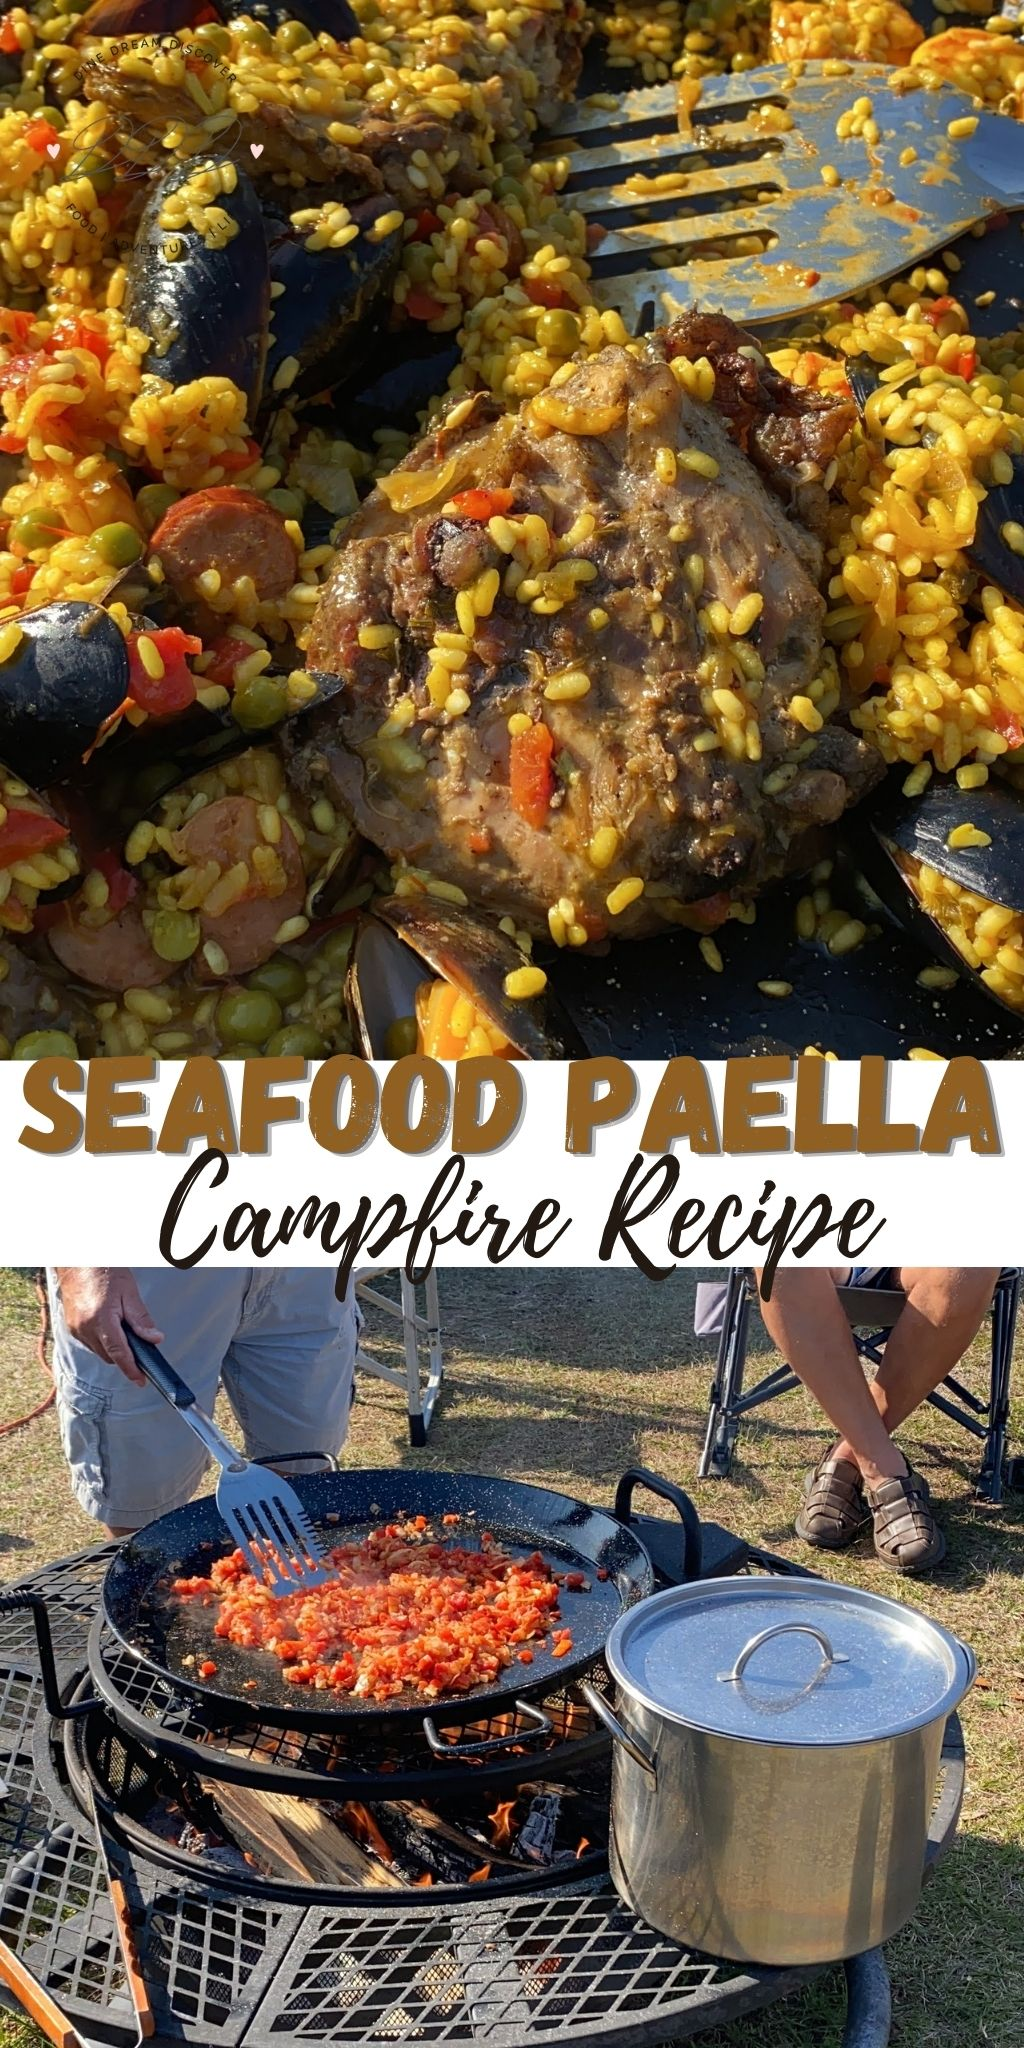 Seafood Mixed Paella